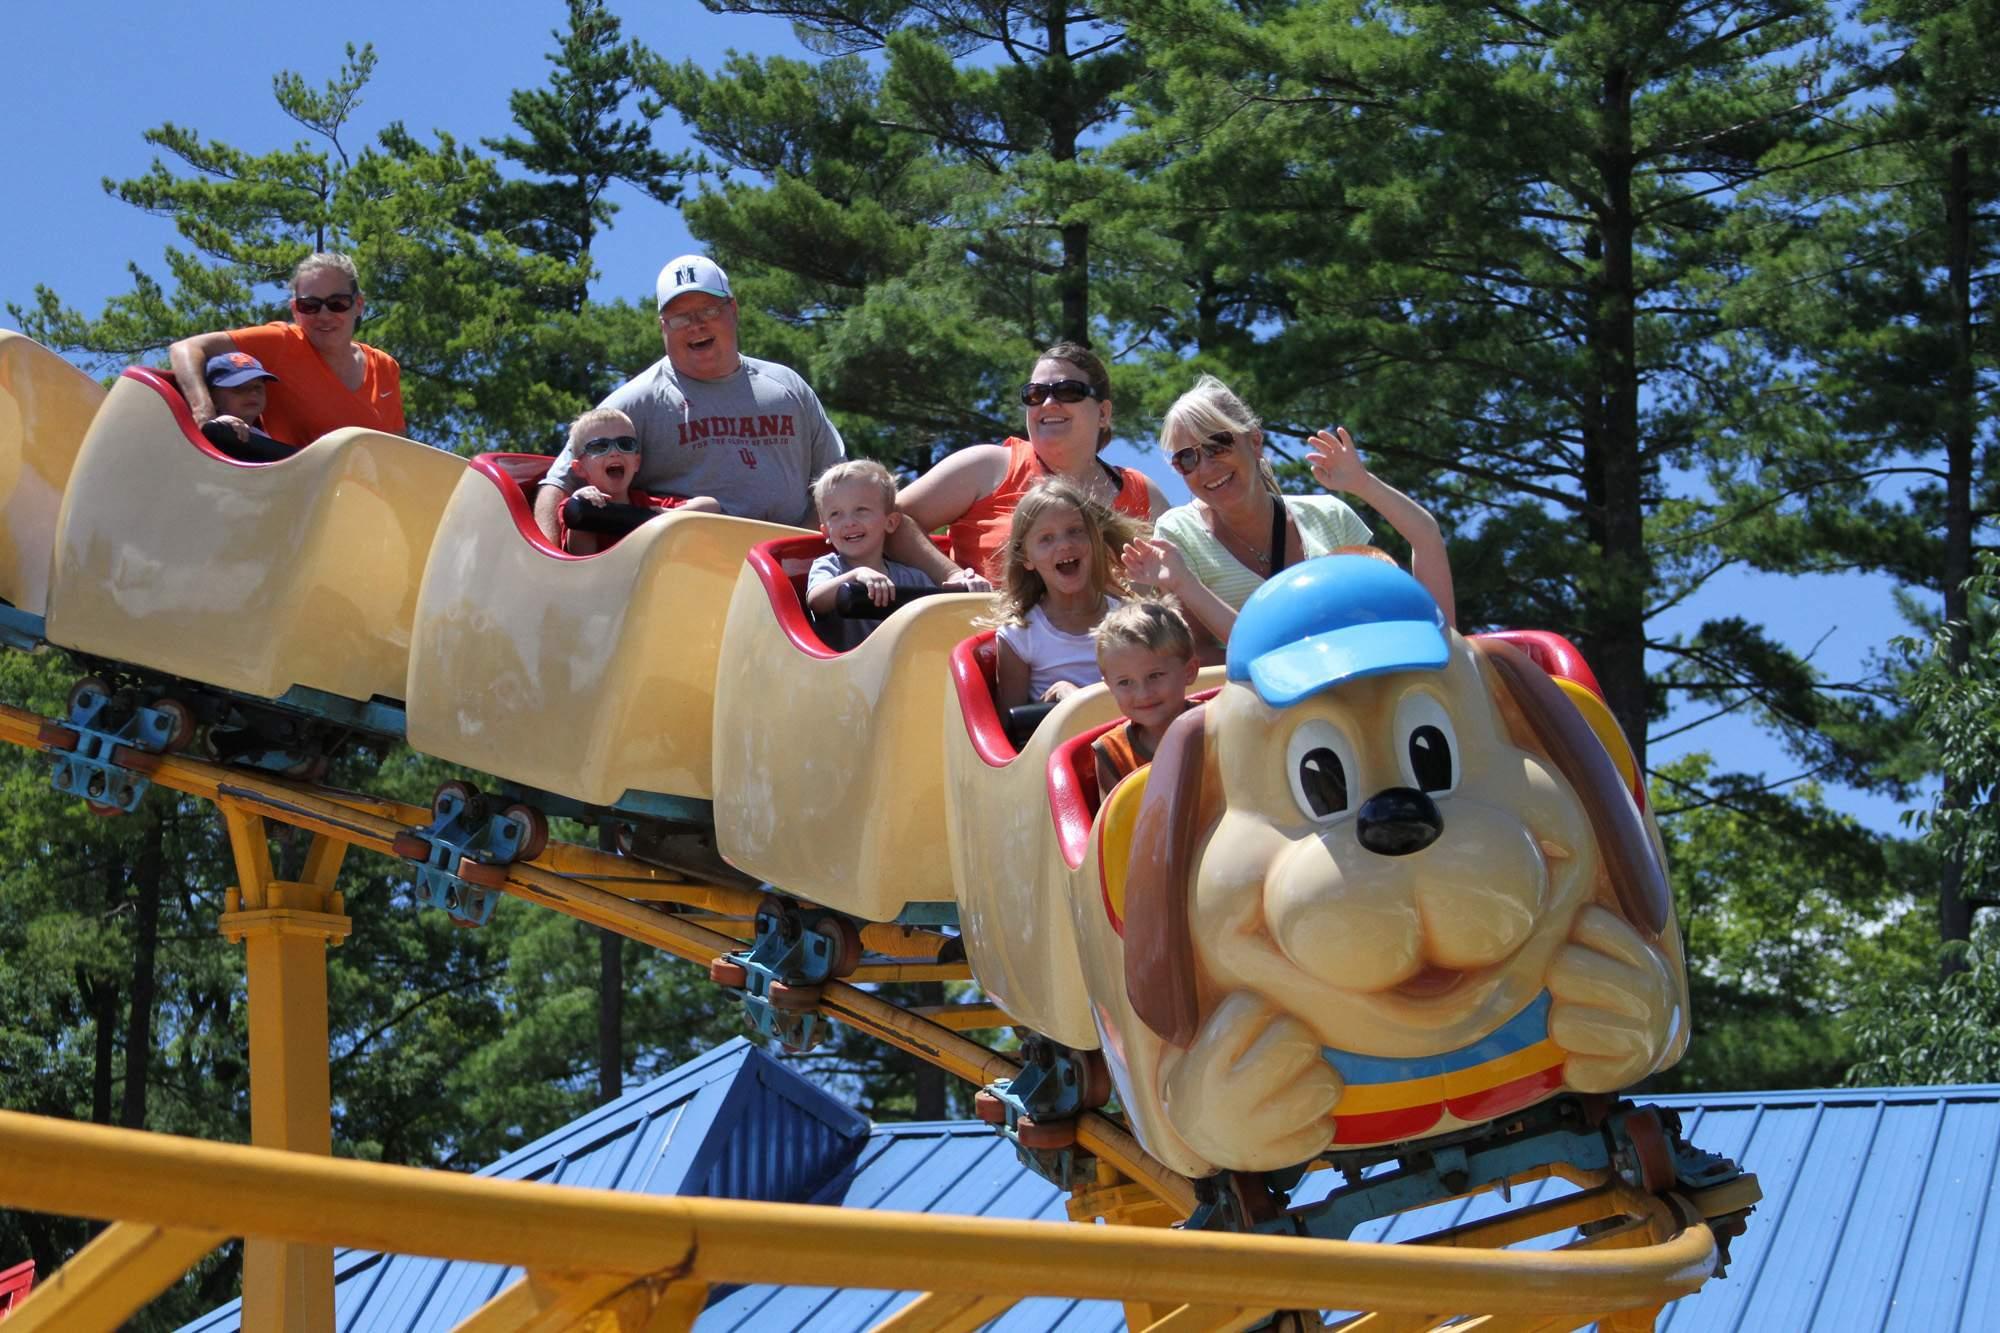 The Howler Family Roller Coaster | Holiday World & Splashin' Safari